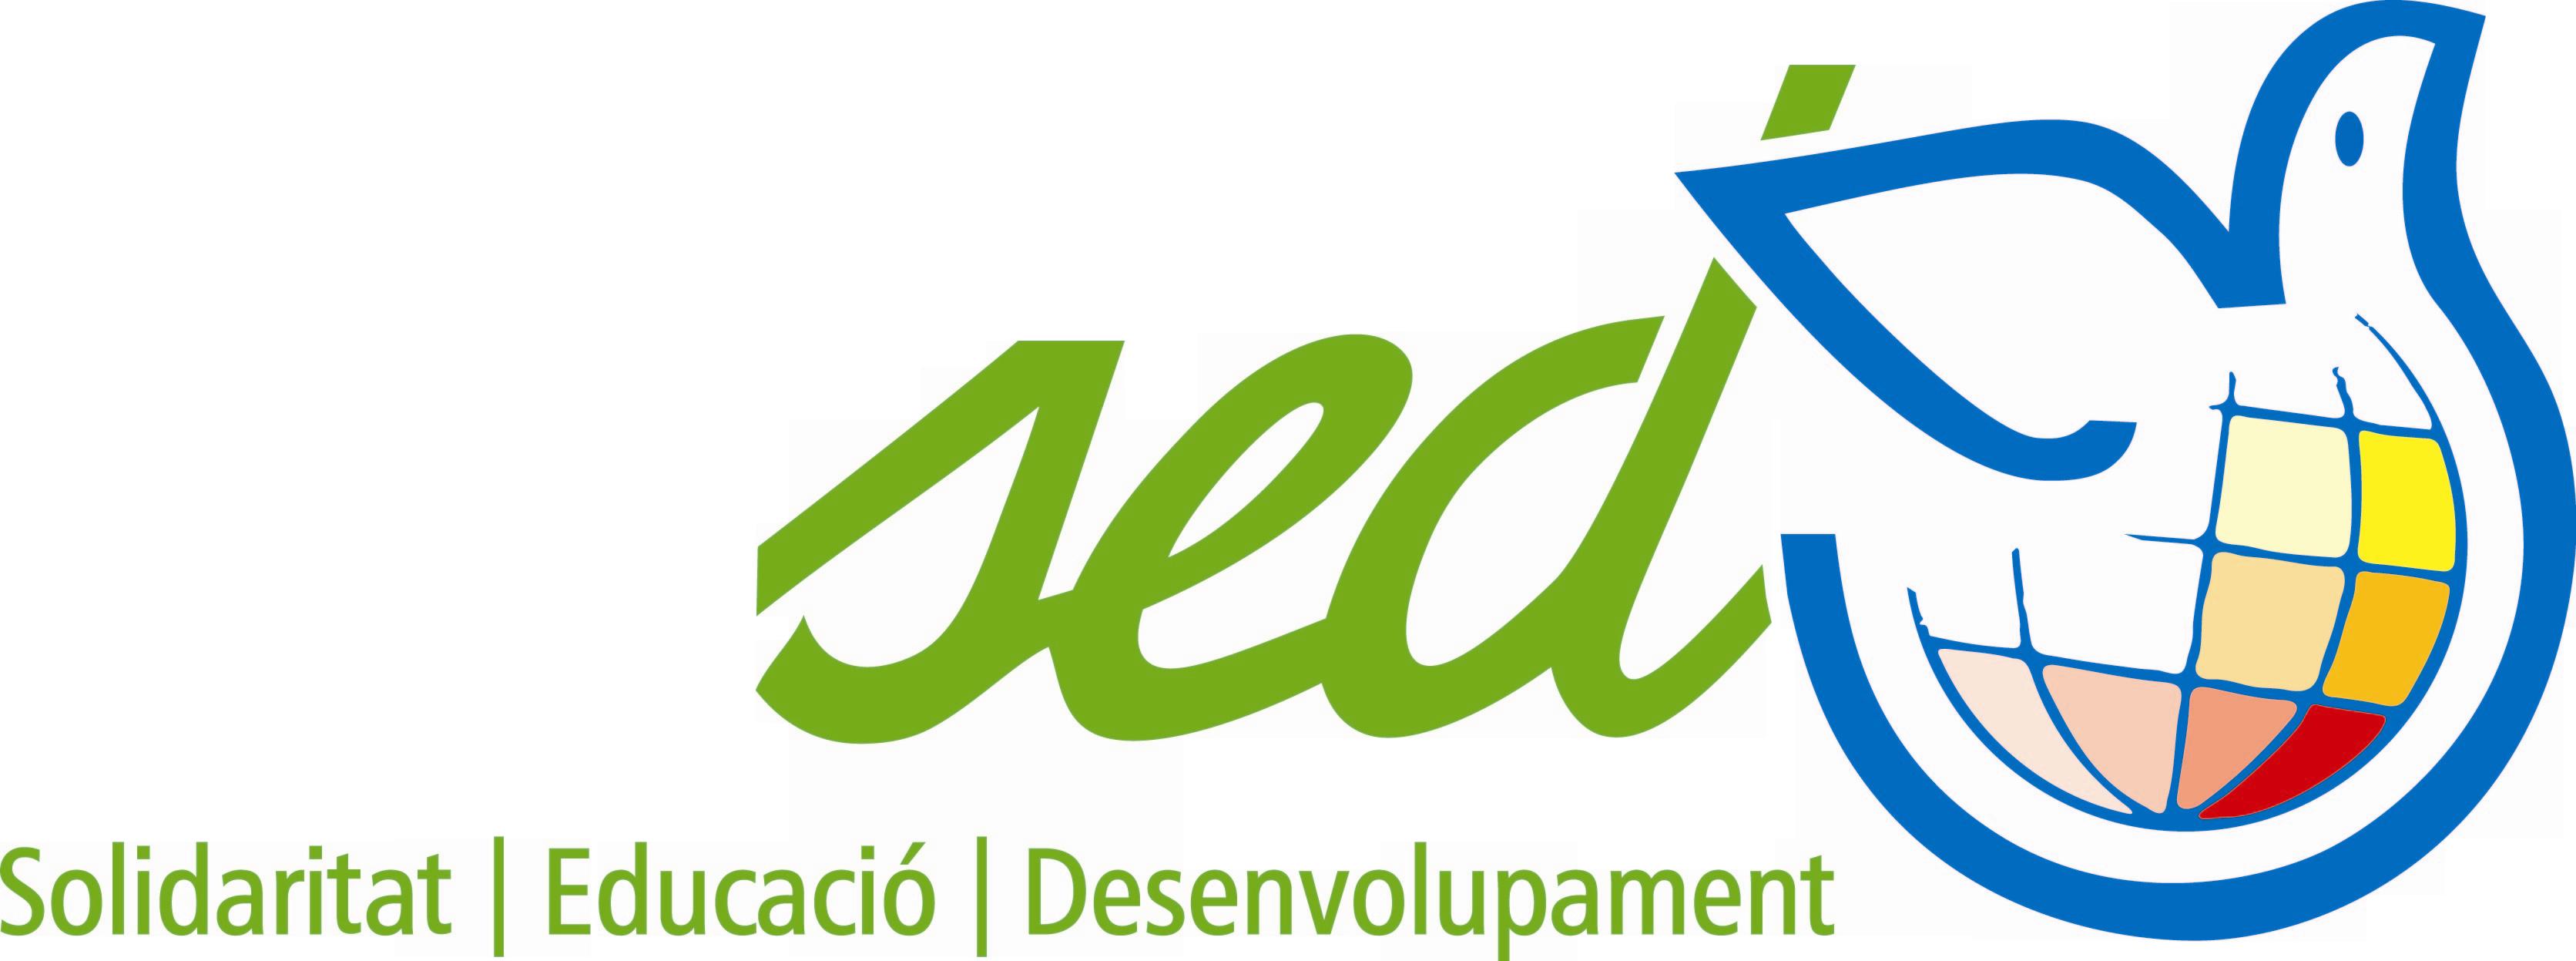 SED Catalunya